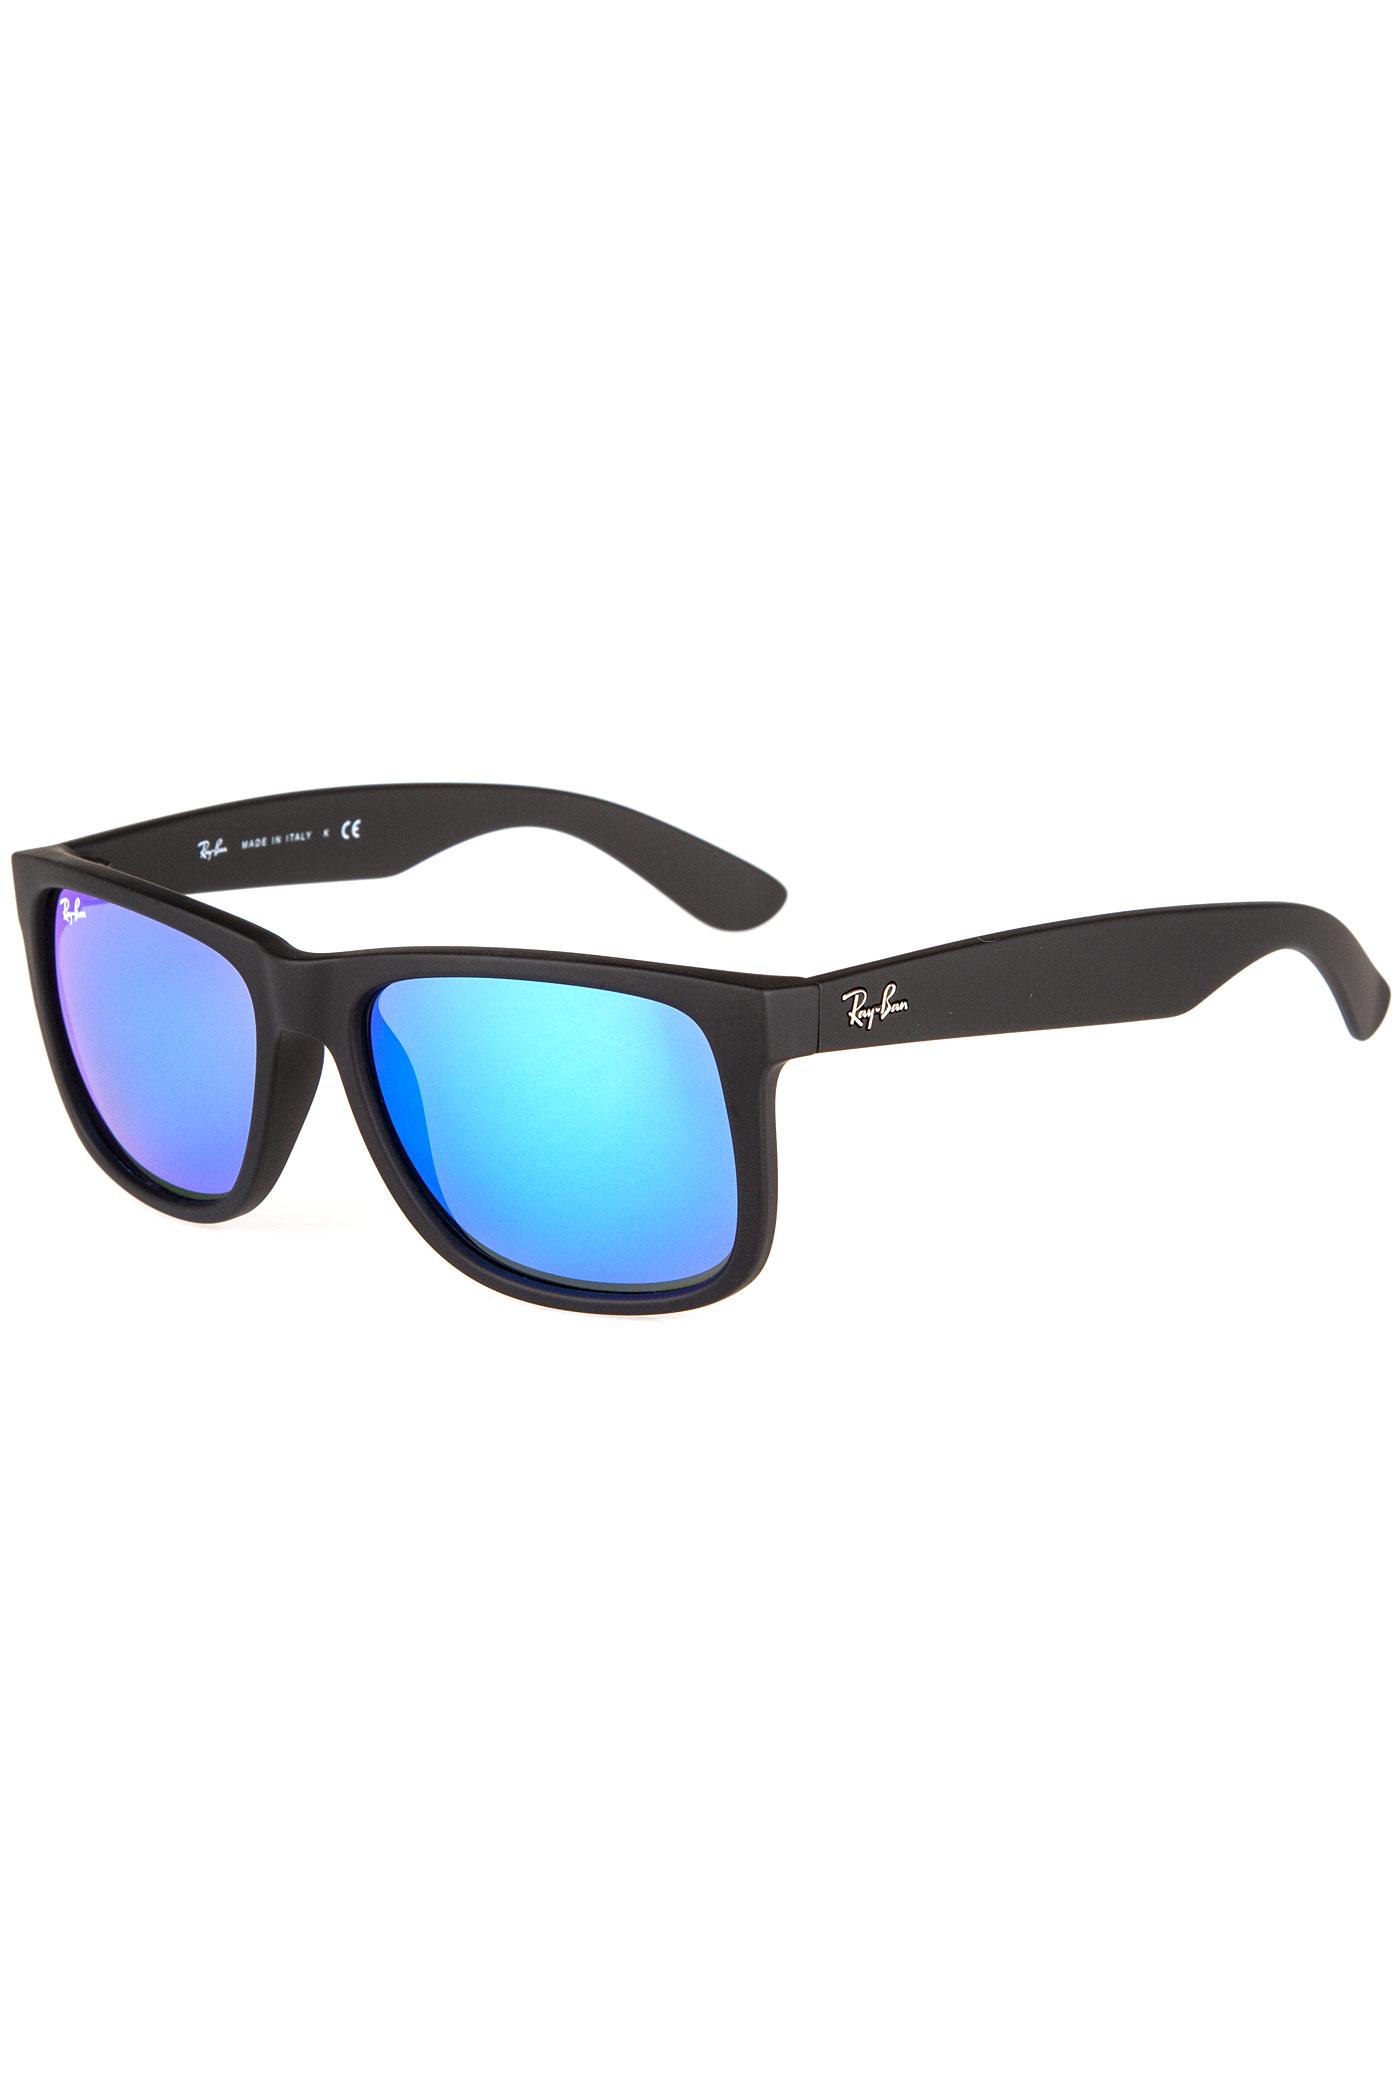 ray ban sonnenbrille thailand